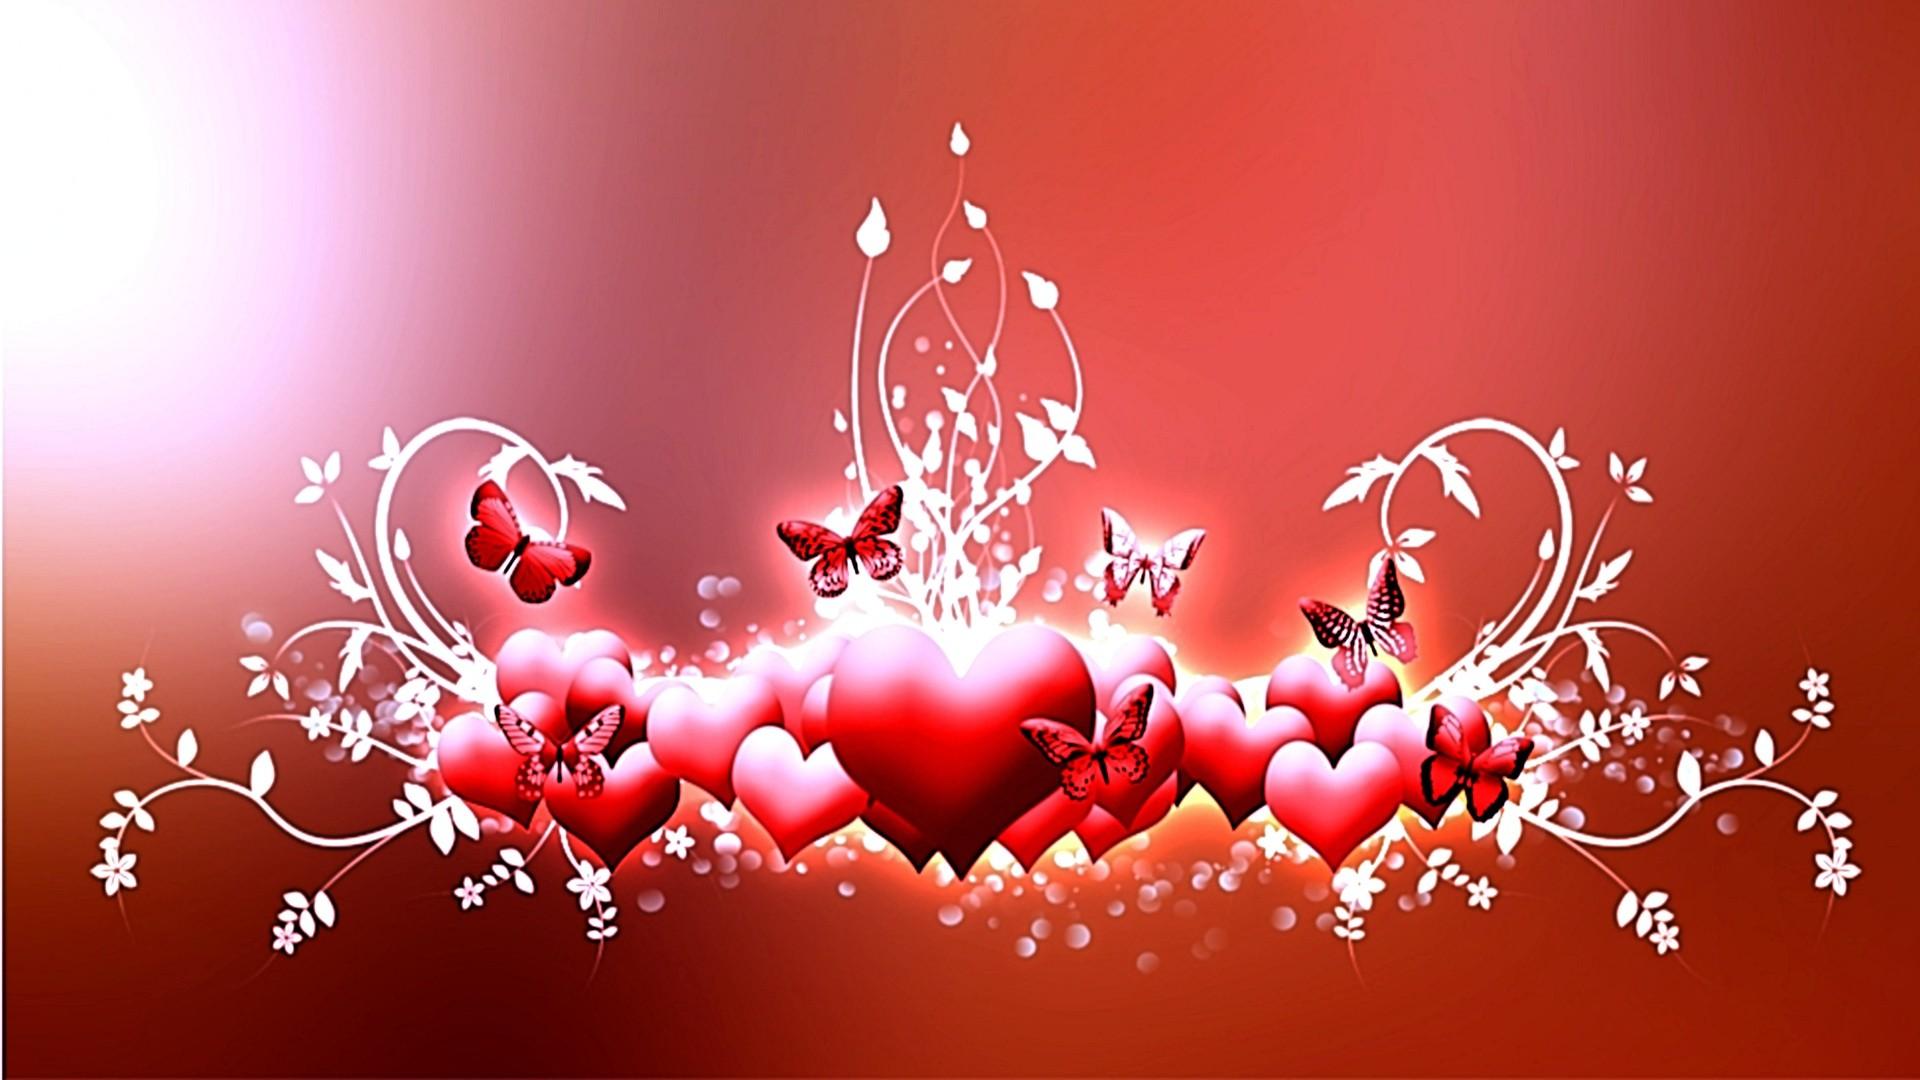 Love Heart Wallpaper Hd Wallpapertag: Love Hearts Wallpaper ·① WallpaperTag